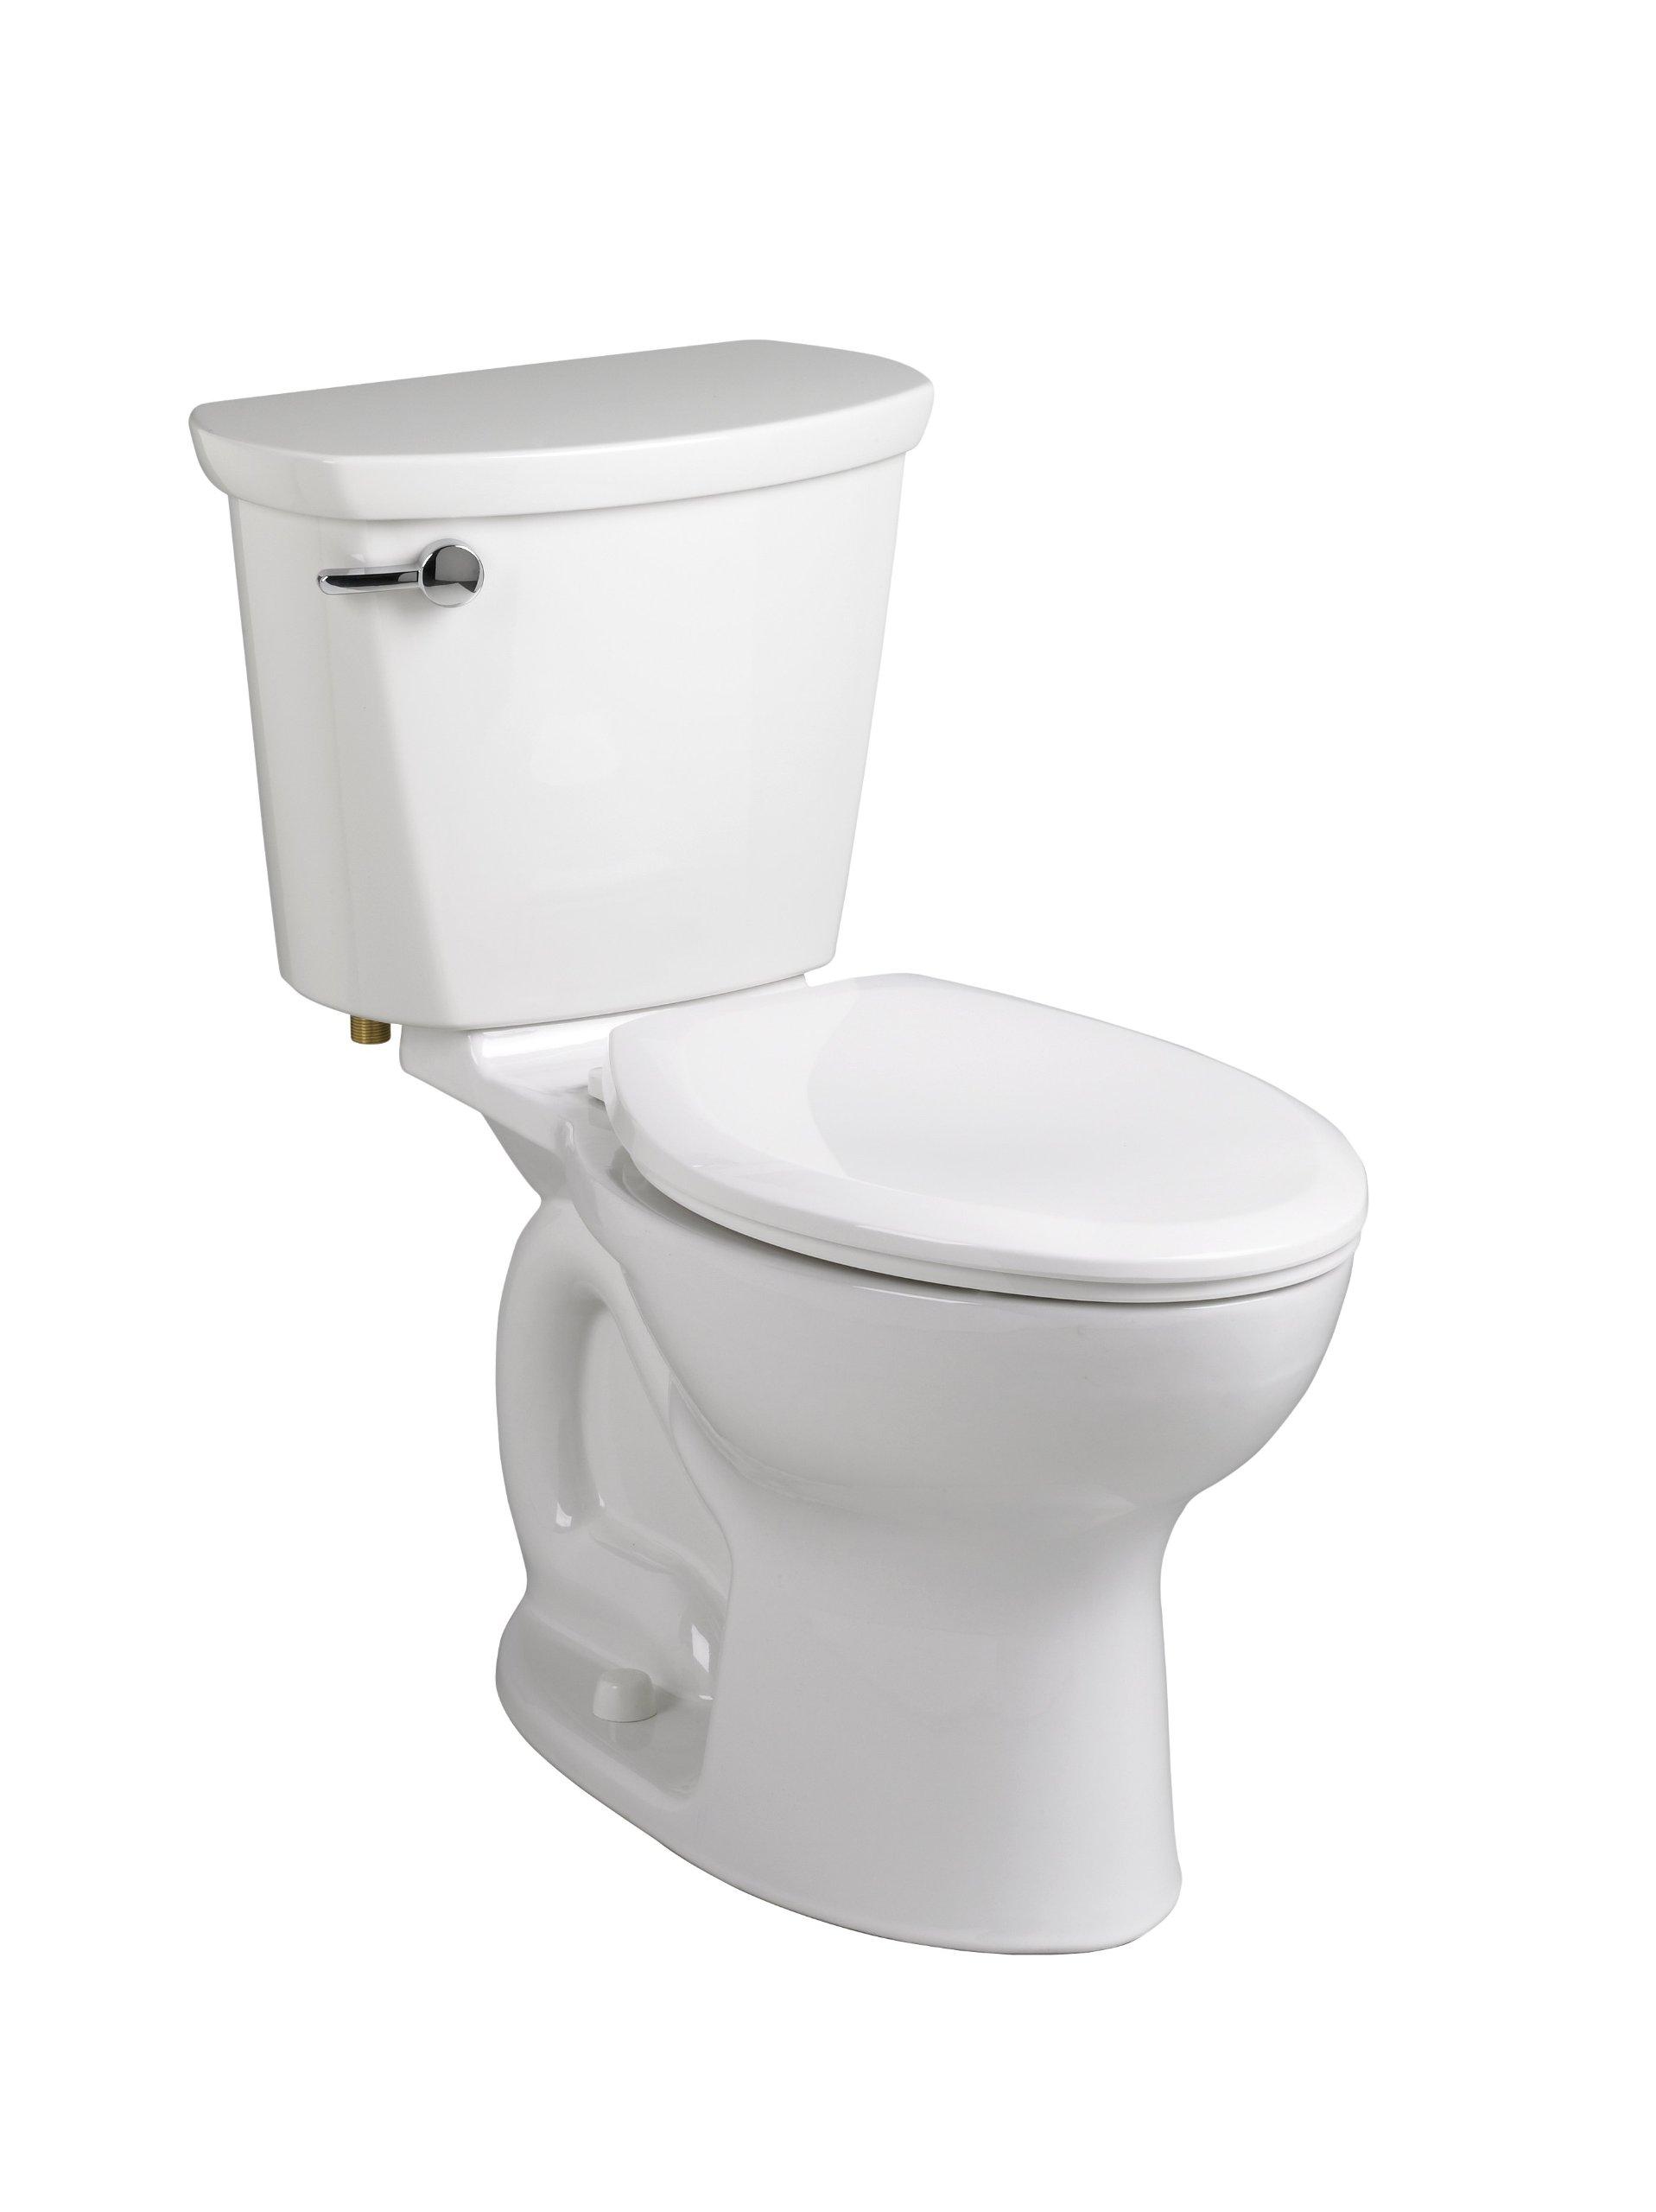 American Standard 211CA.104.020 Toilet, White